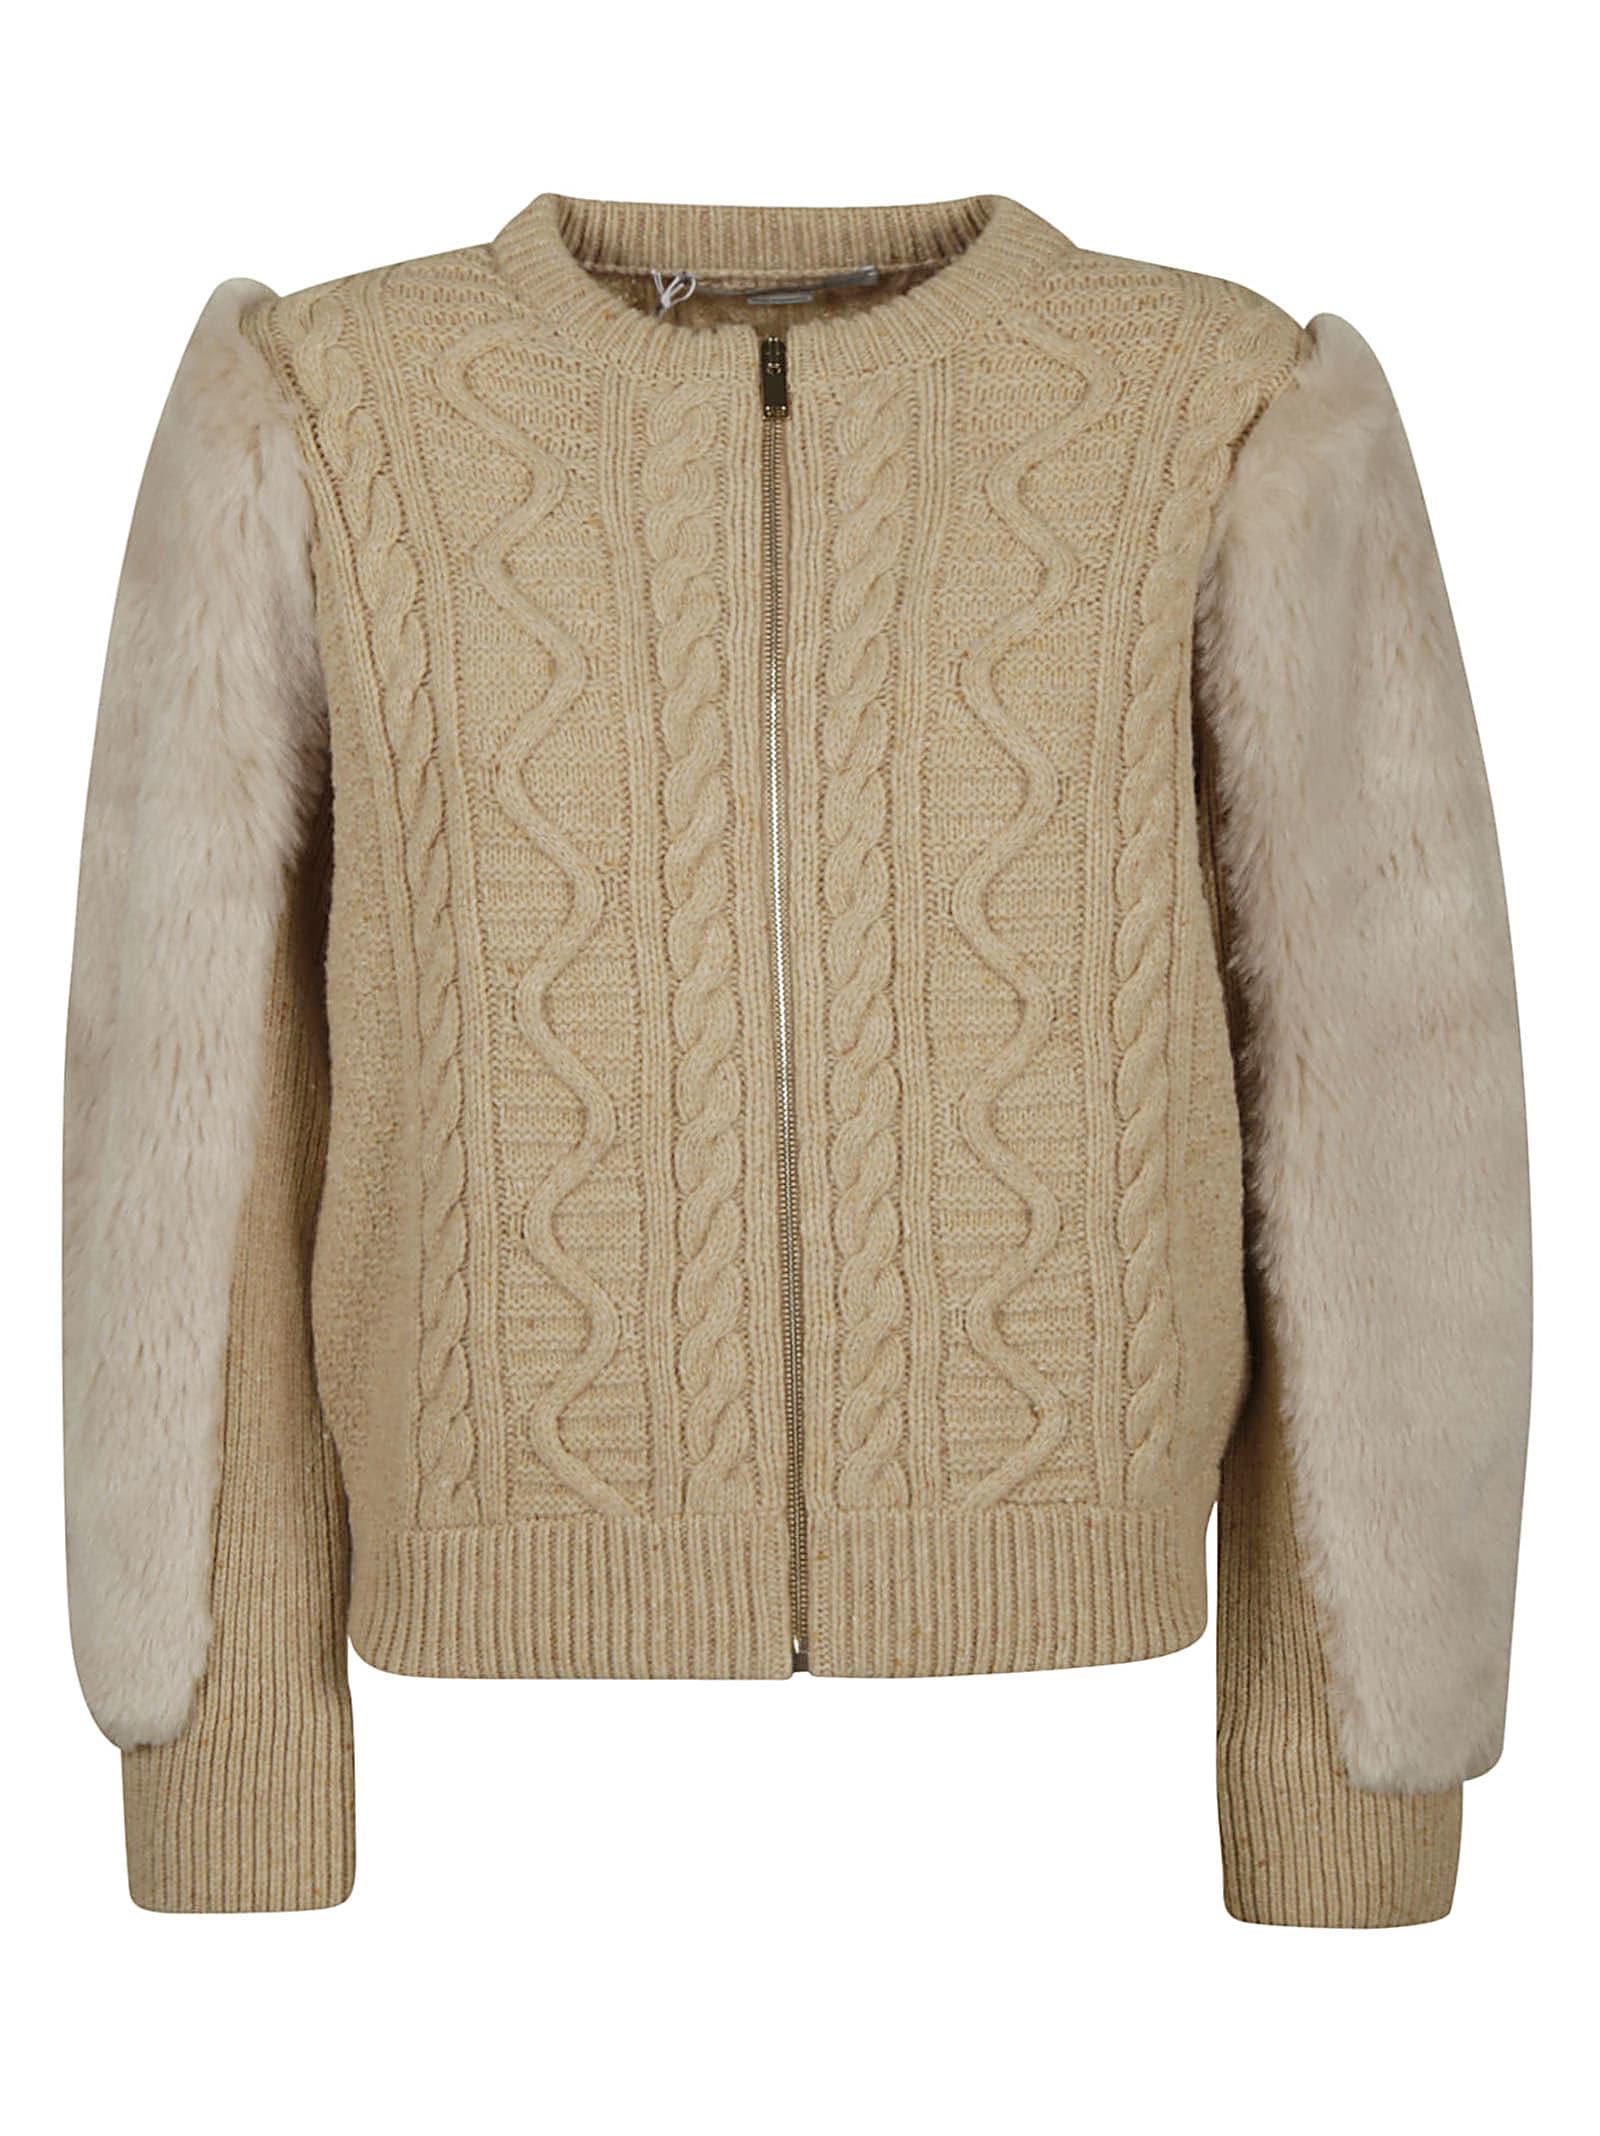 Stella McCartney Fur Applique Zipped Woven Jacket